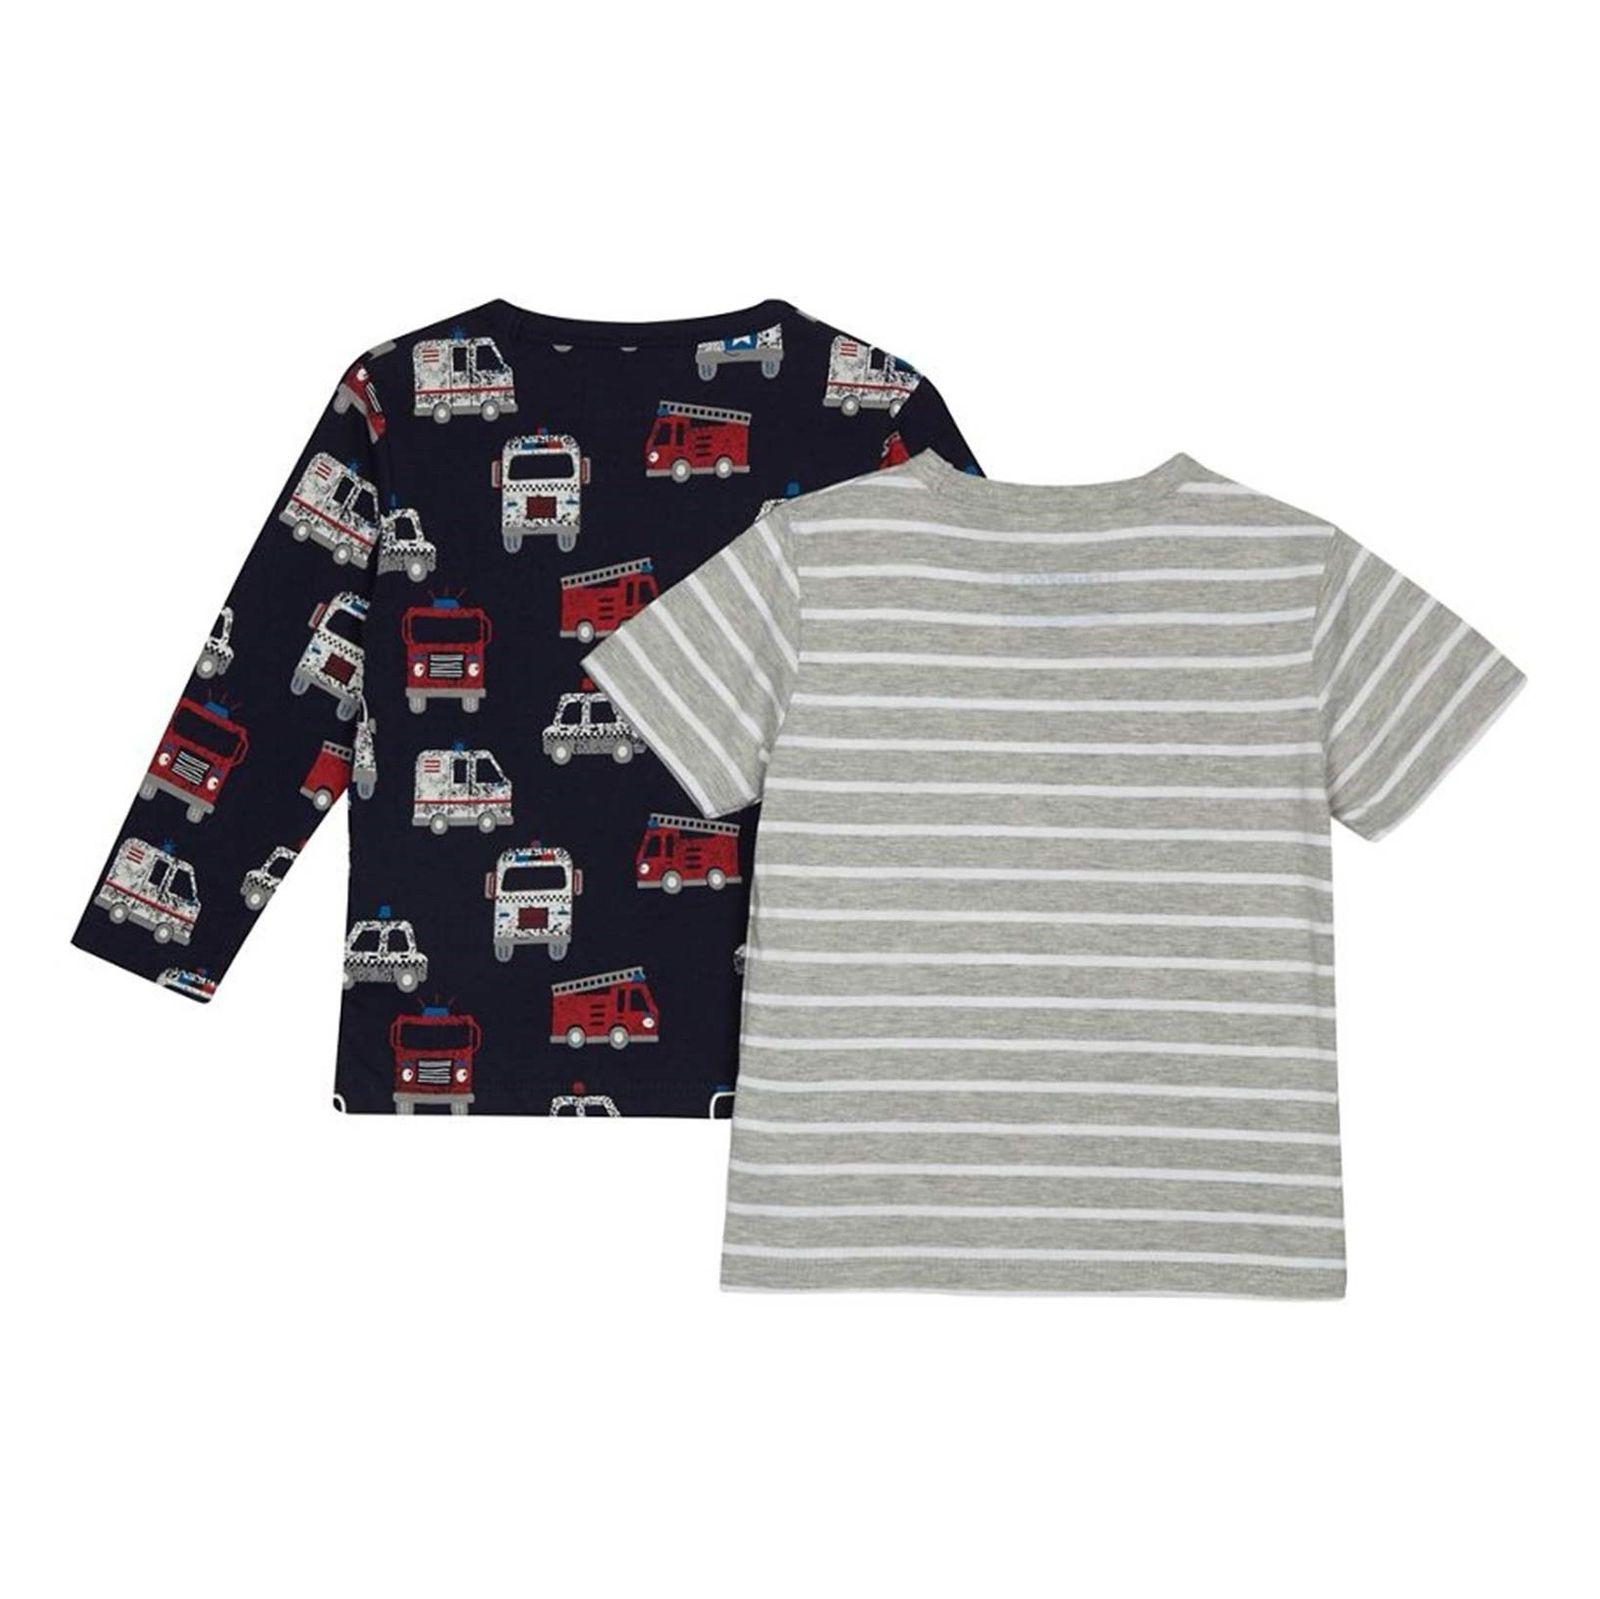 تی شرت نخی یقه گرد پسرانه بسته 2 عددی - بلوزو - طوسي/سرمه اي - 2